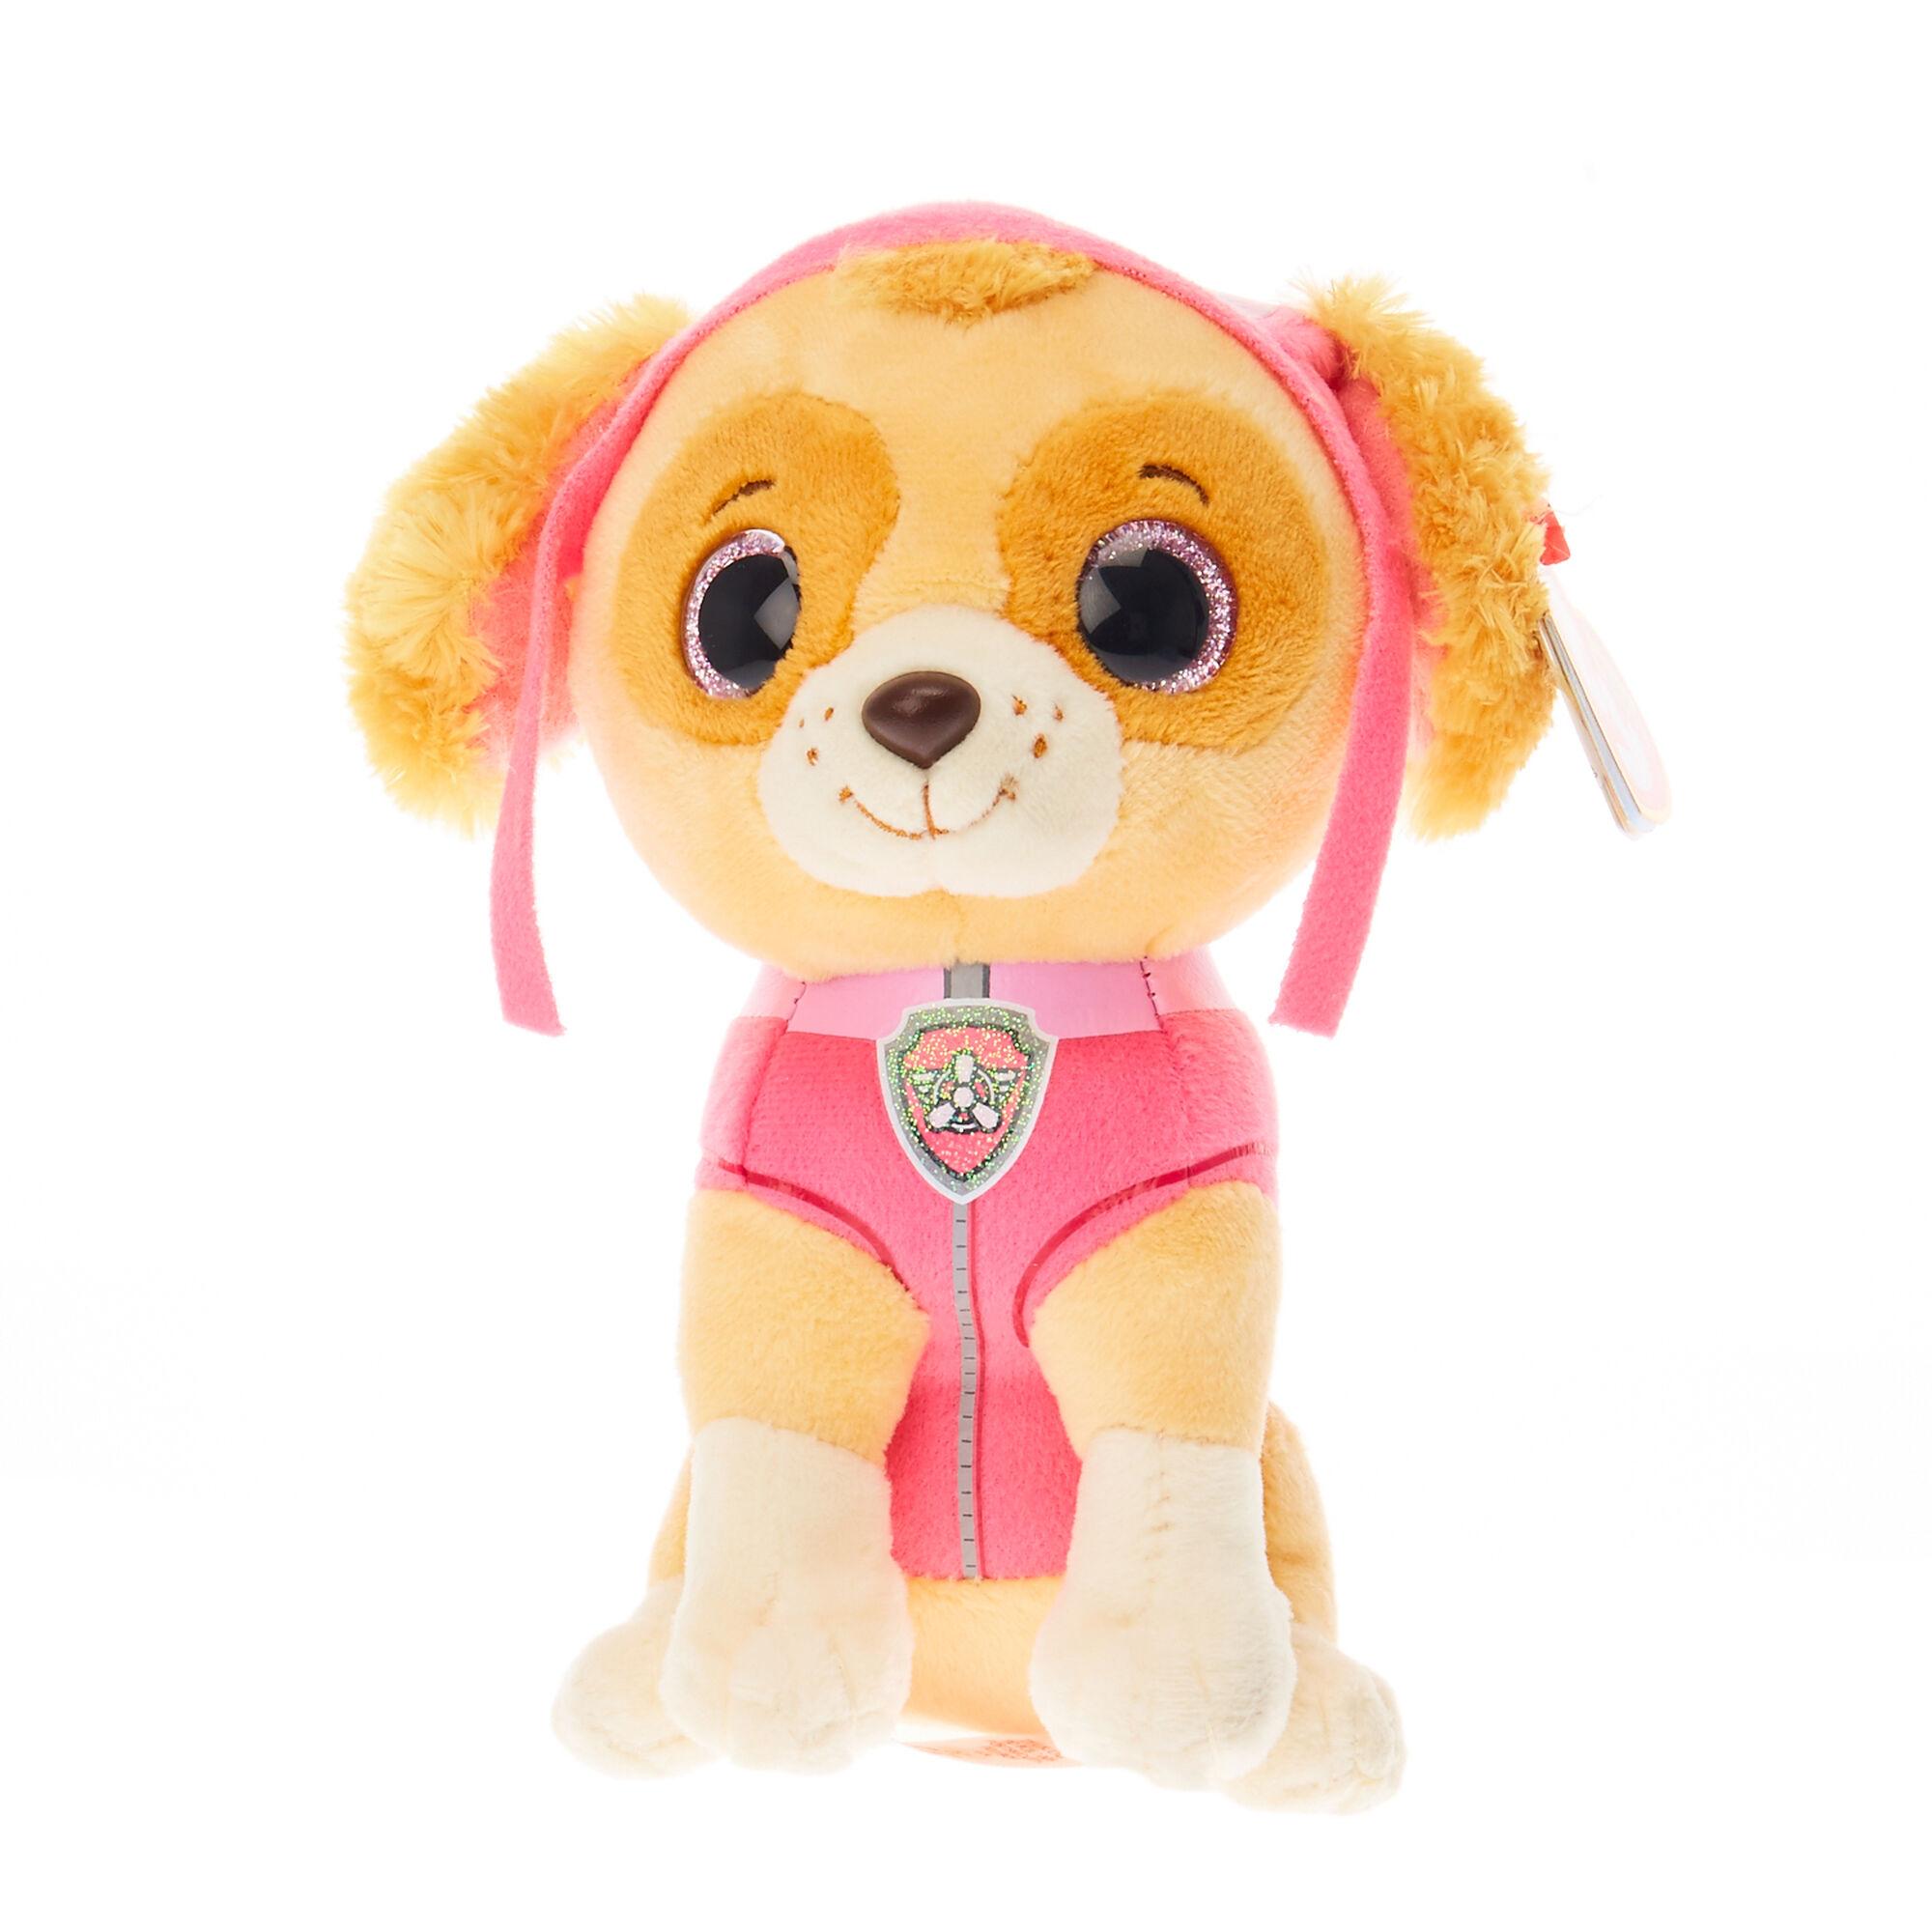 TY Beanie Boo Small Paw Patrol Skye Soft Toy  737e35b8813d